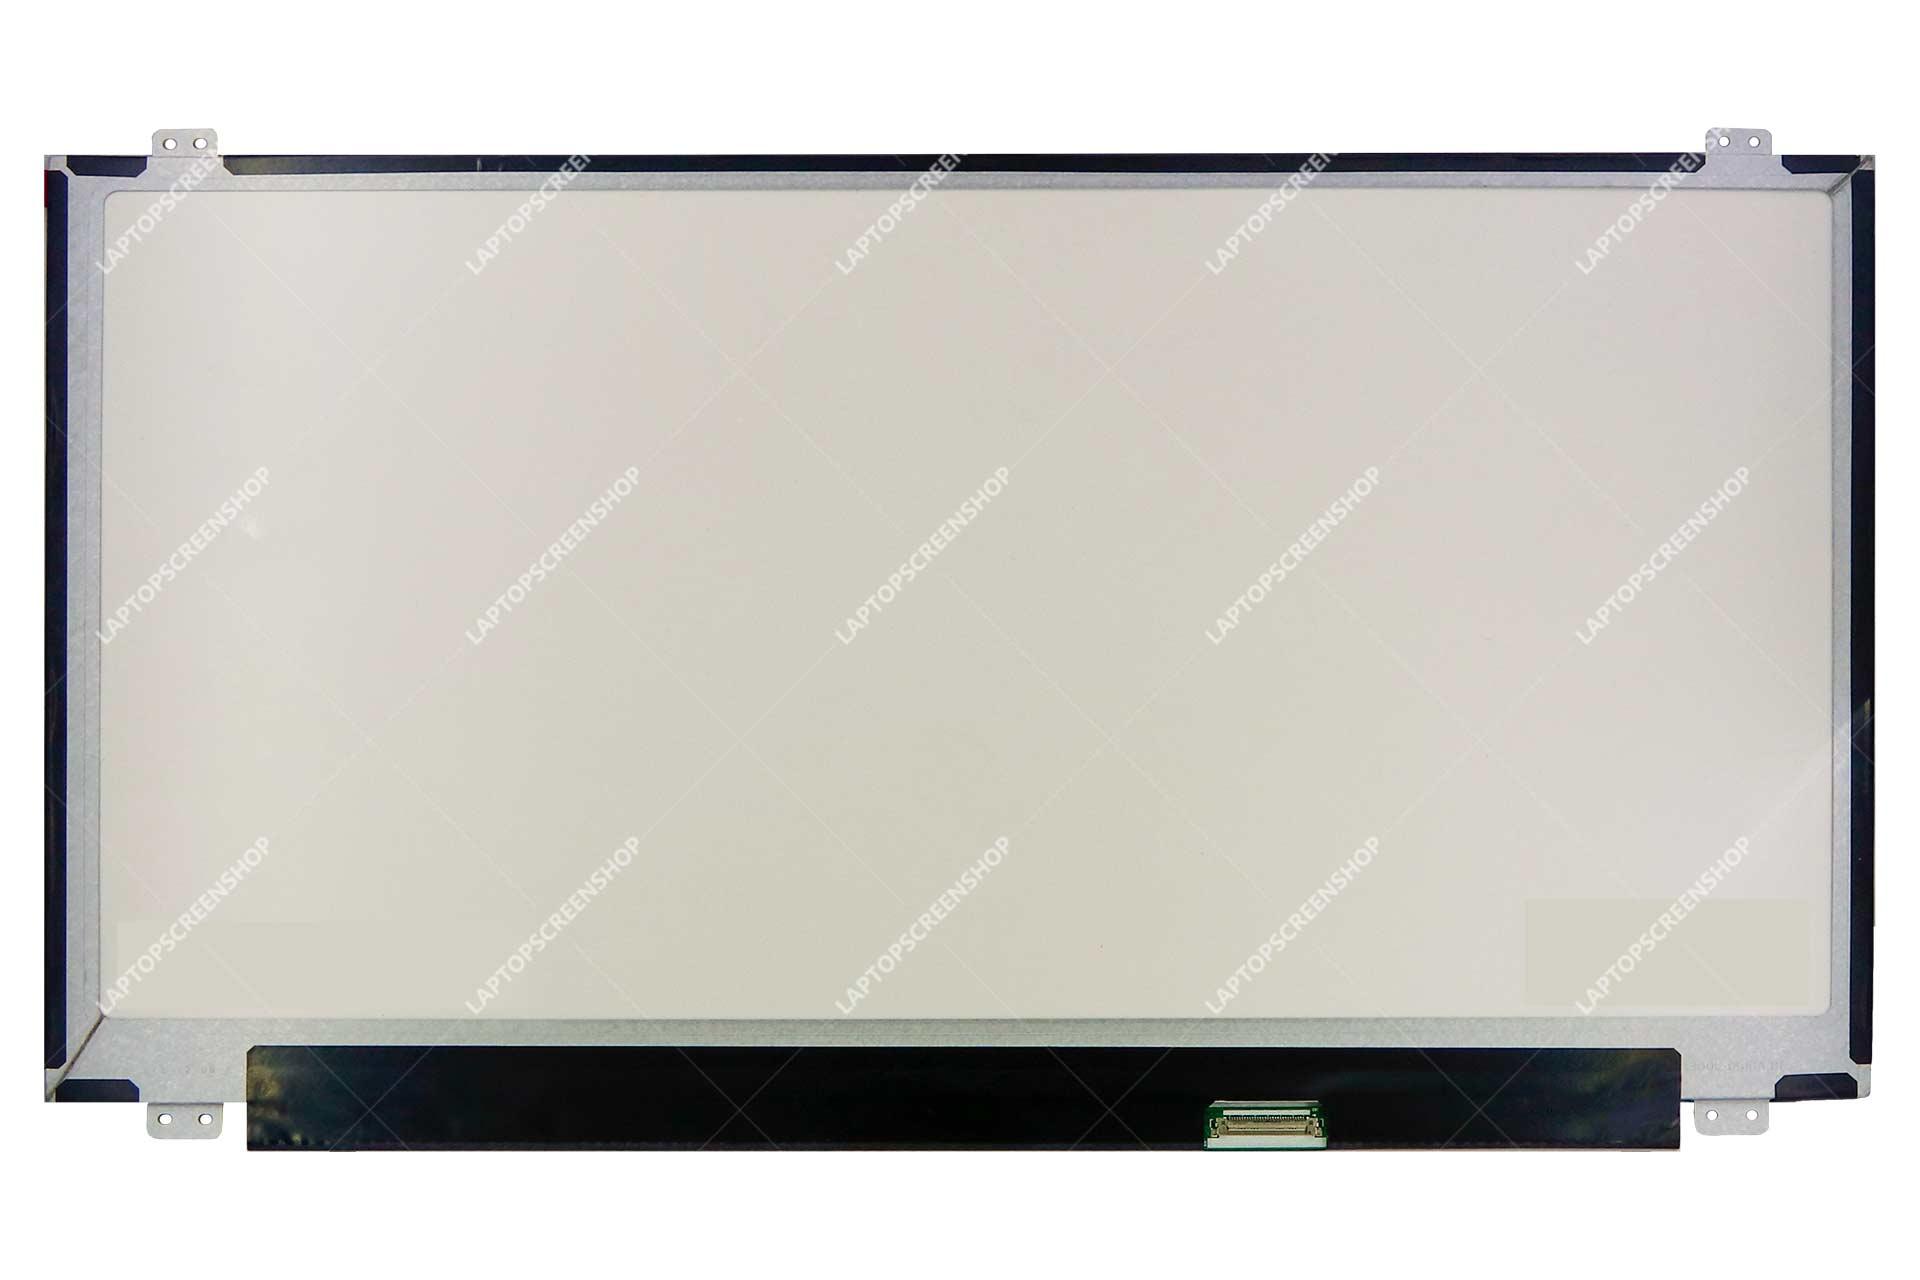 ACER-ASPIRE-E1-472-6496-LCD |HD|فروشگاه لپ تاپ اسکرين | تعمير لپ تاپ